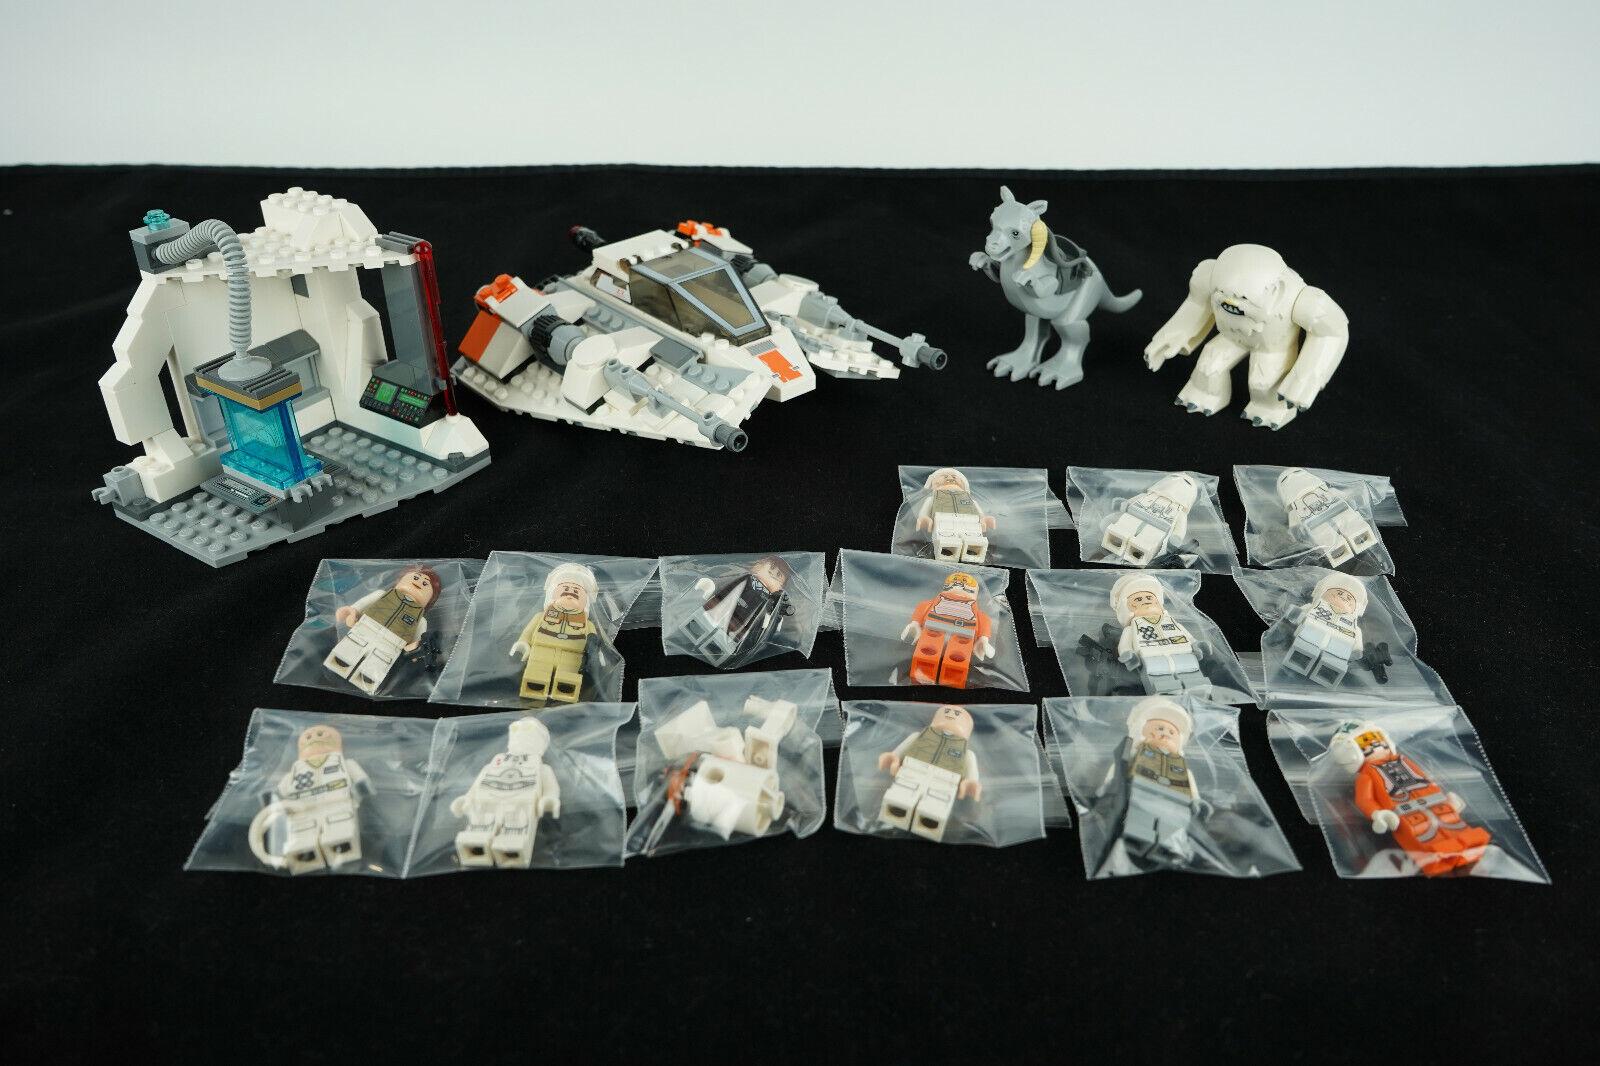 Lego Star Wars Assault On Hoth Set 75098 Mini Figures R3-A2 K-3PO Snowspeeder